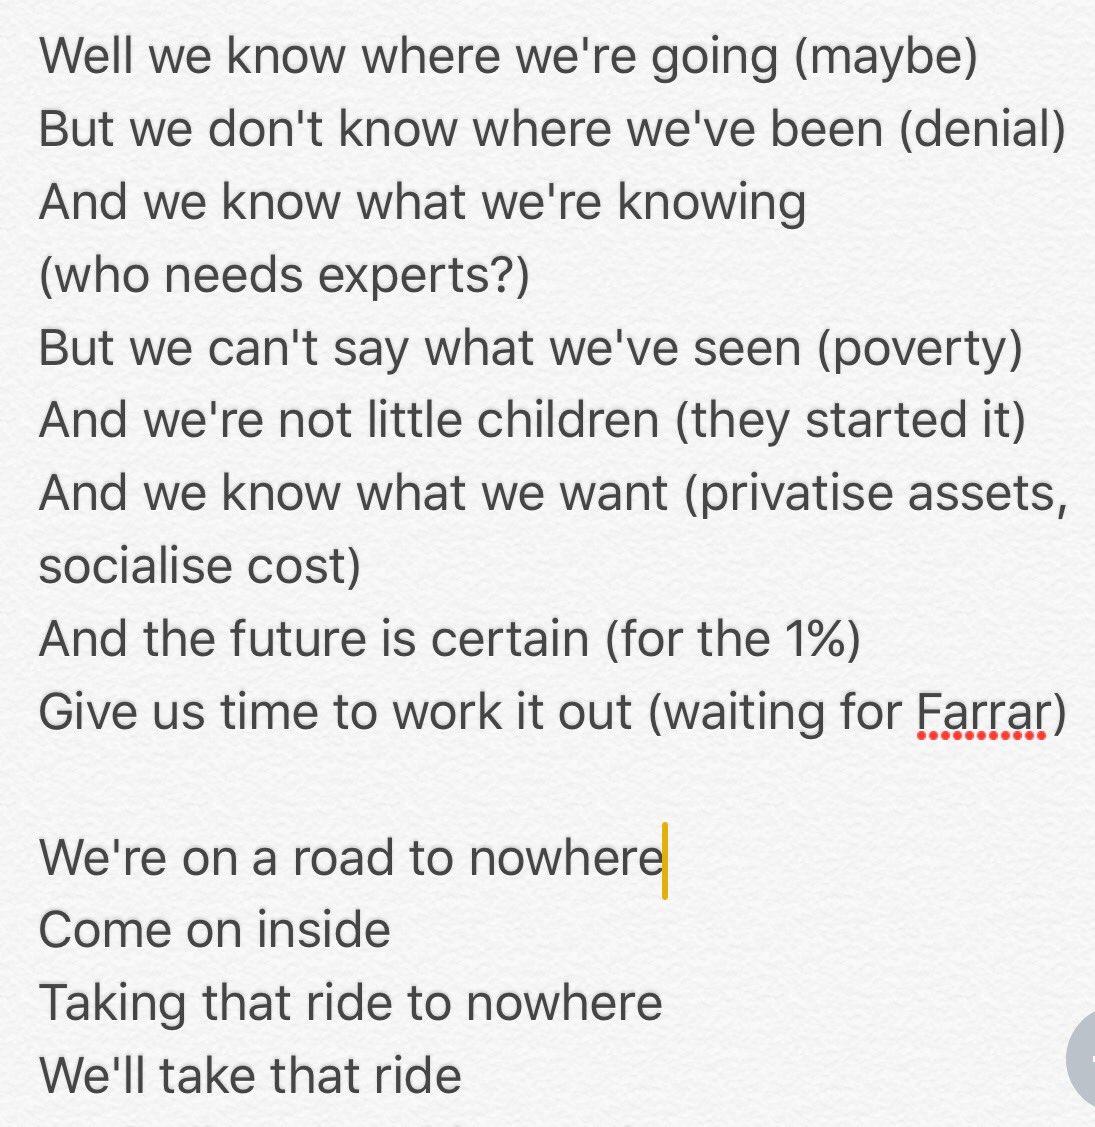 #changethegovt #nzpol #roadtonowhere https://t.co/mImM6veOq6